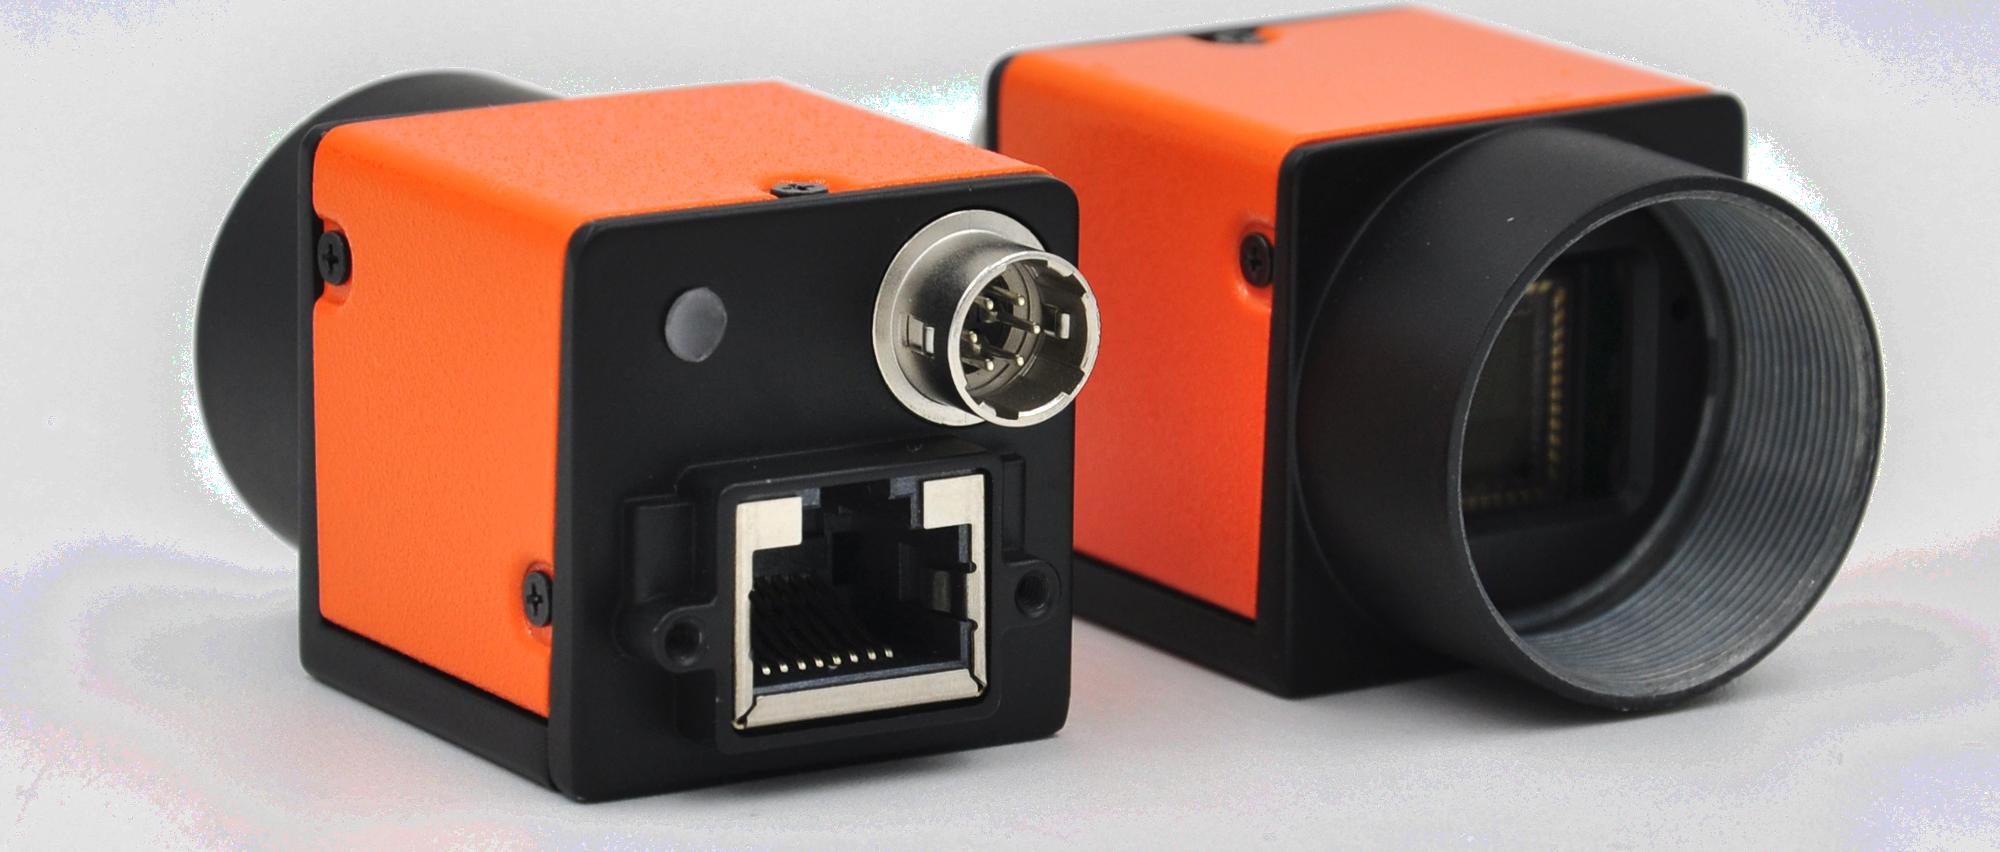 Mars800-200gc High Speed Gige 200fps Python Mini Global Cmos Industrial  Camera - Buy Gige Cmos Camera,Global Shutter 200fps Cmos Camera,Mini Cmos  Gige